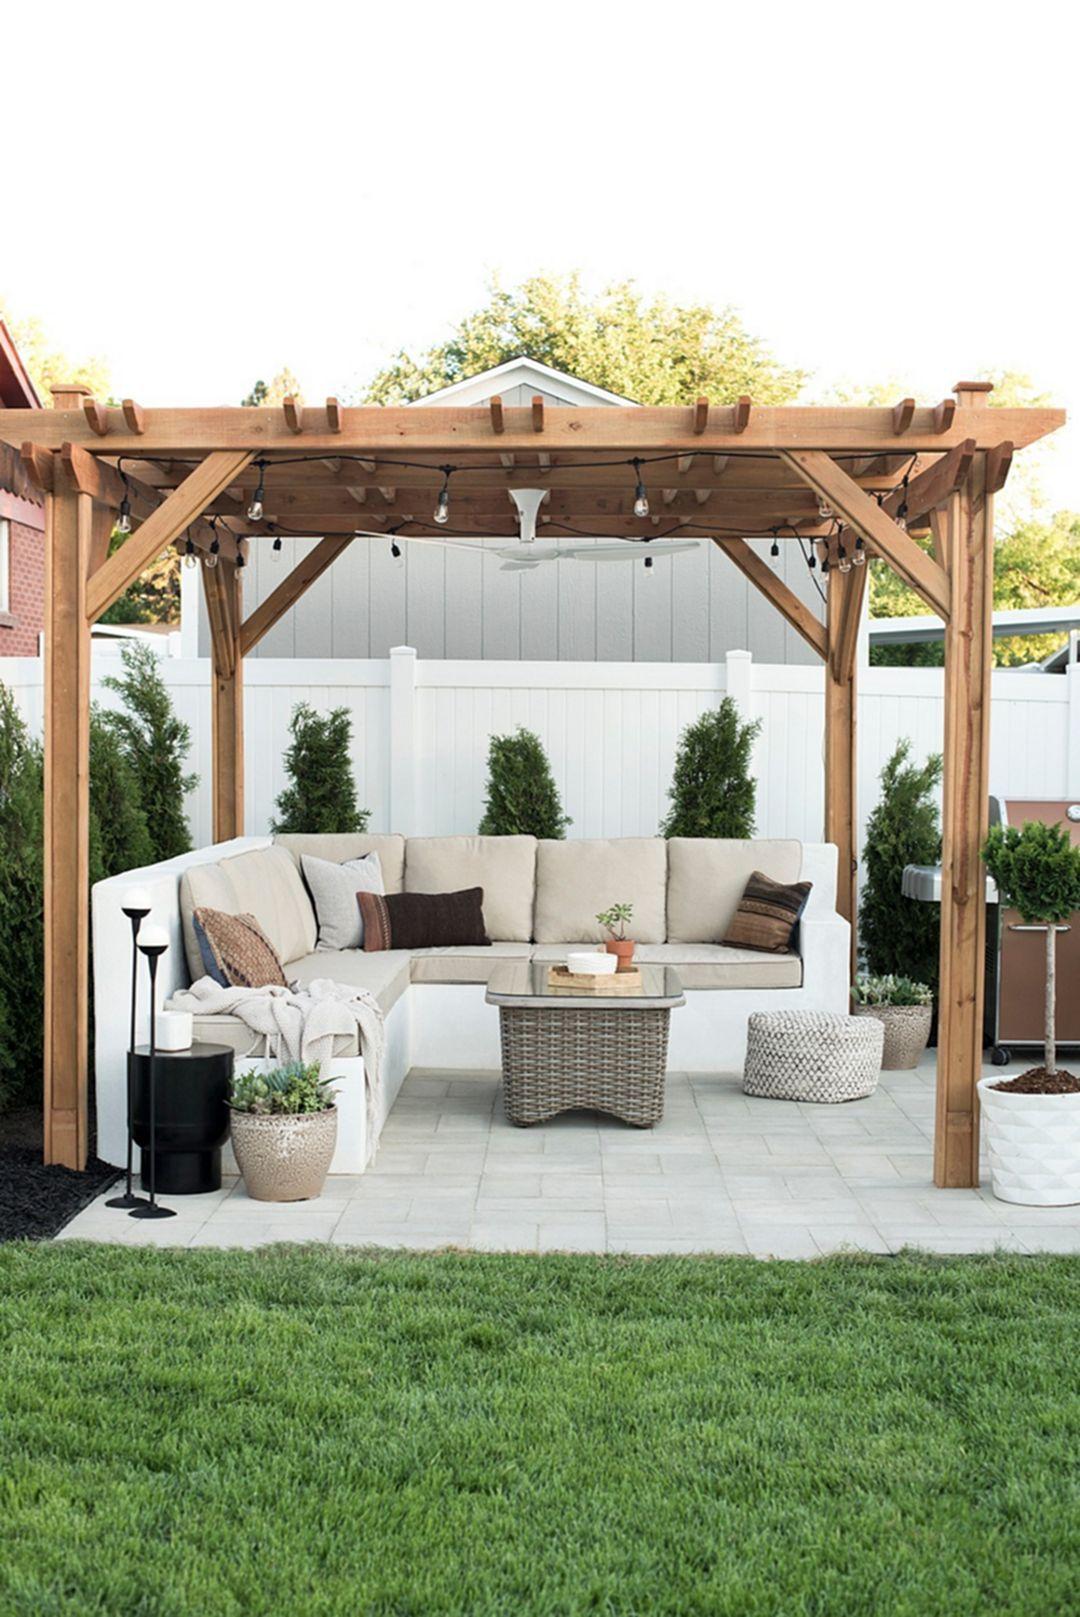 Backyard Retreat 4017 Backyard Gazebo Backyard Patio Designs